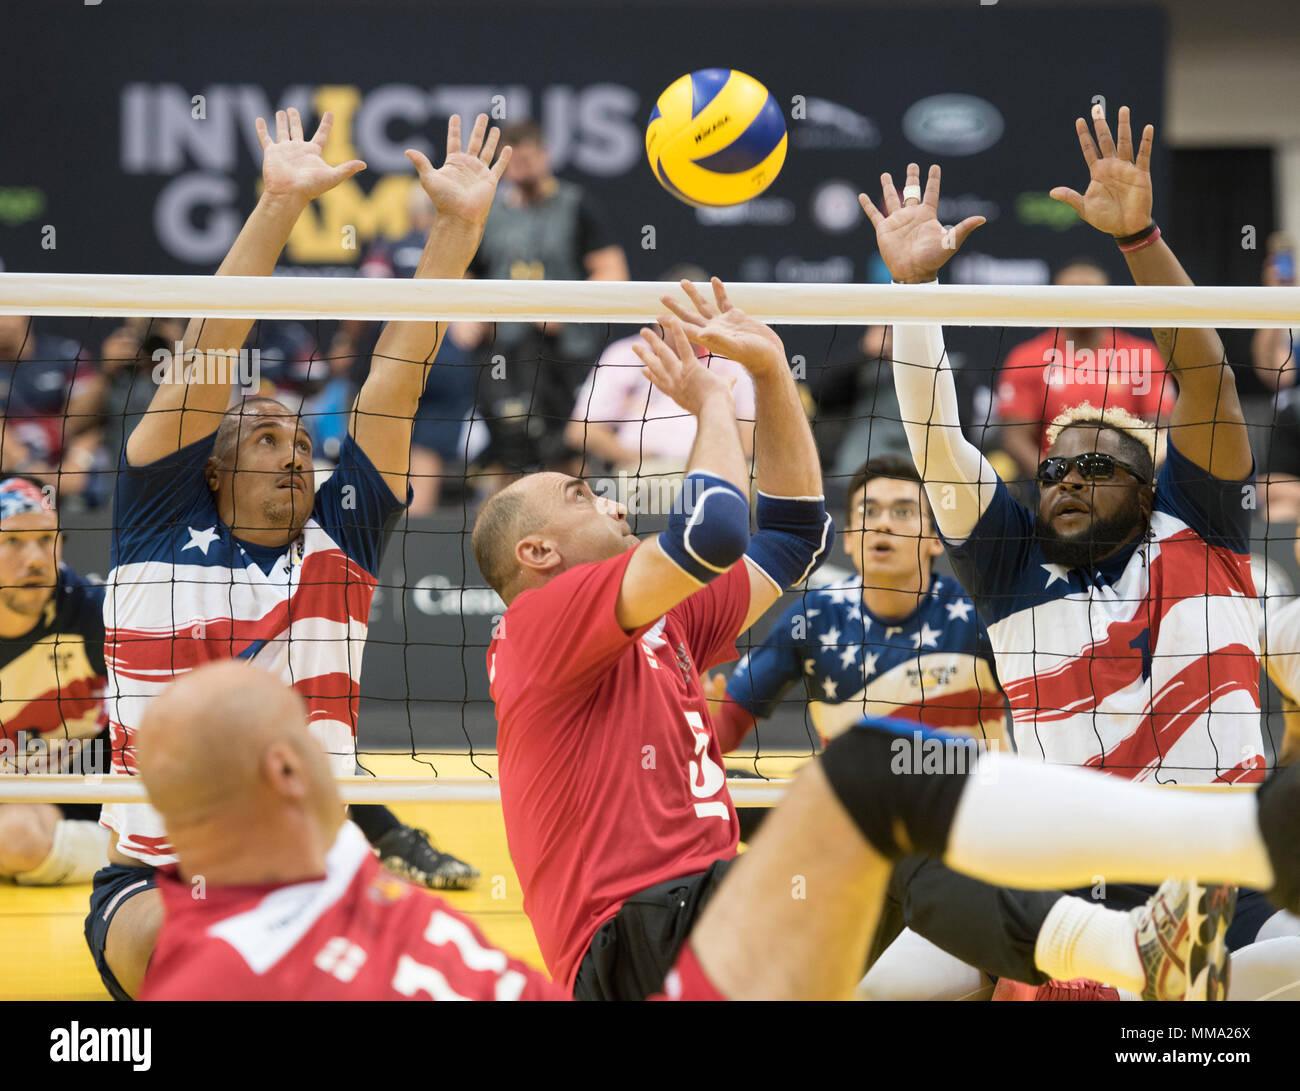 El Compiten Voleibol Centro Atletismo Sentados Atletas En De ZuXPki